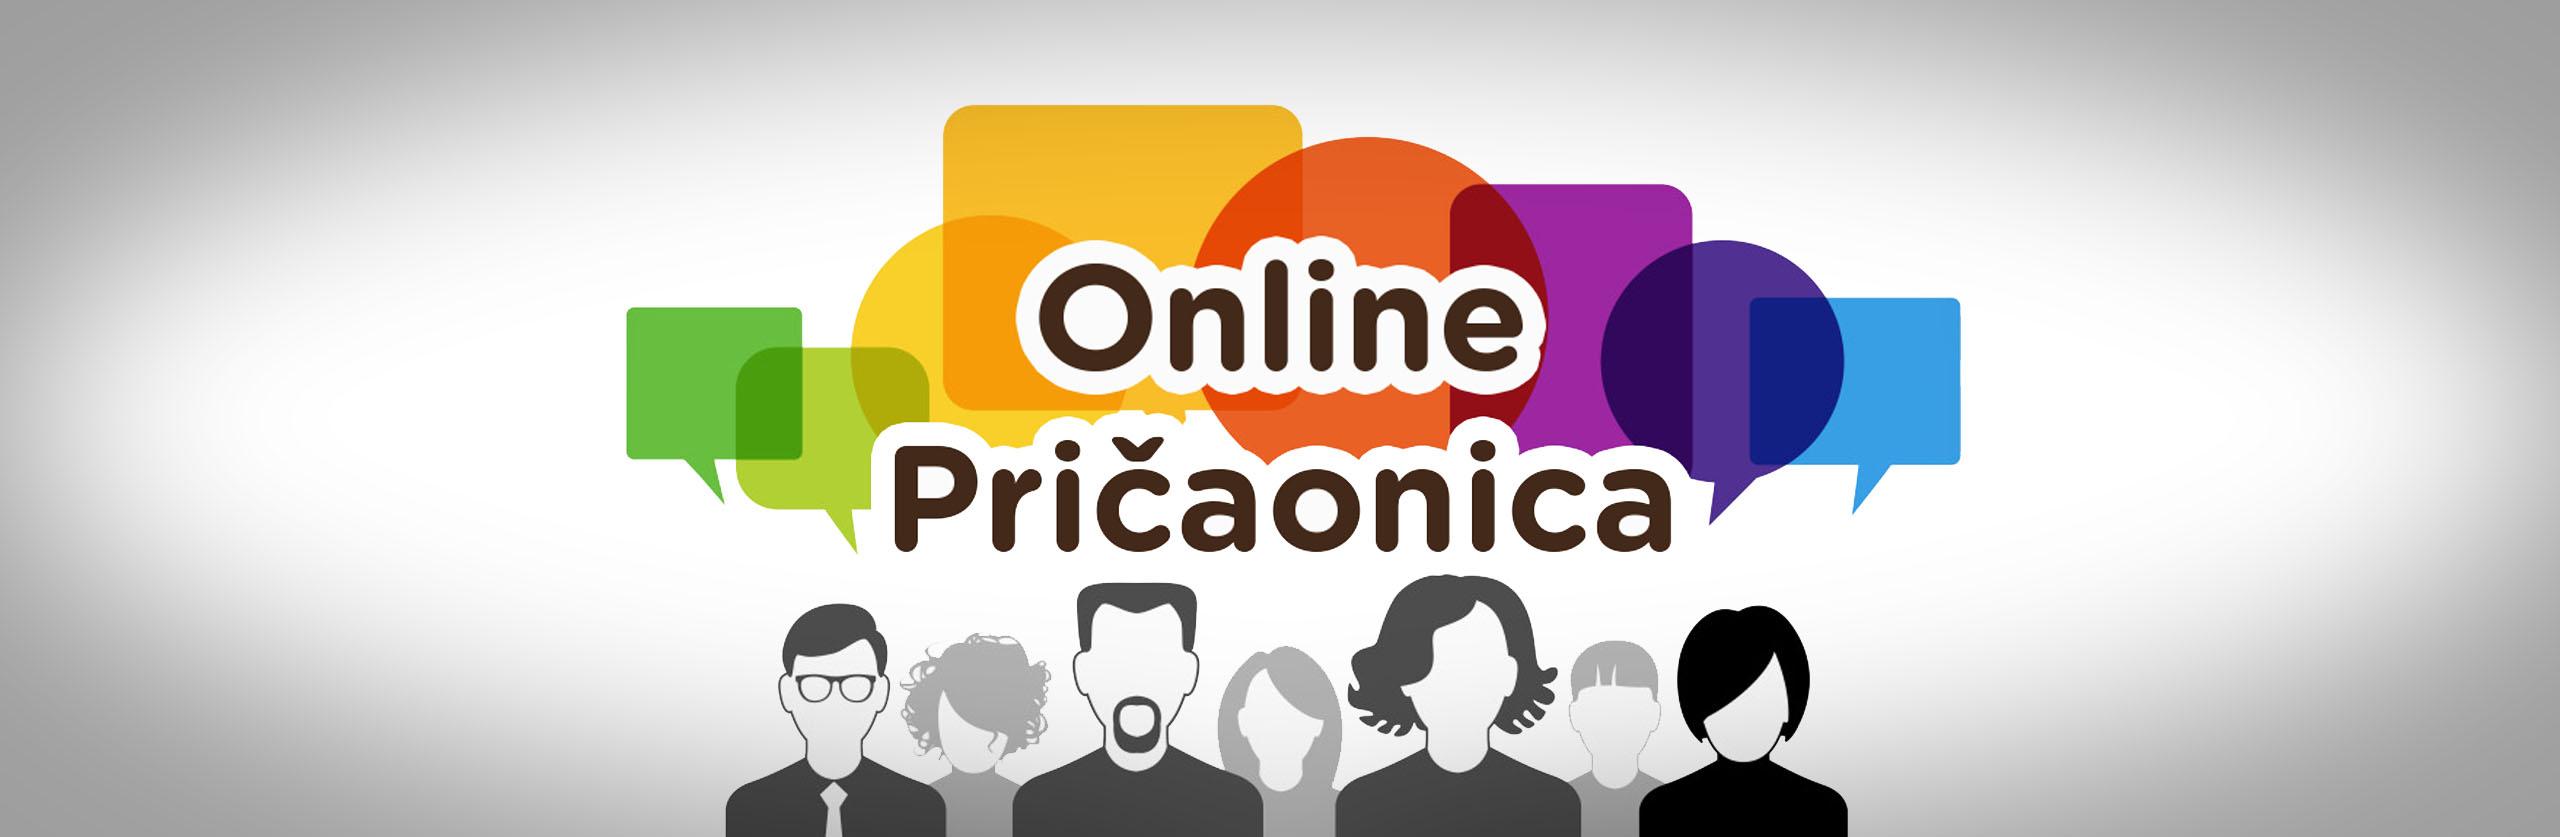 pricaonica_slider_online